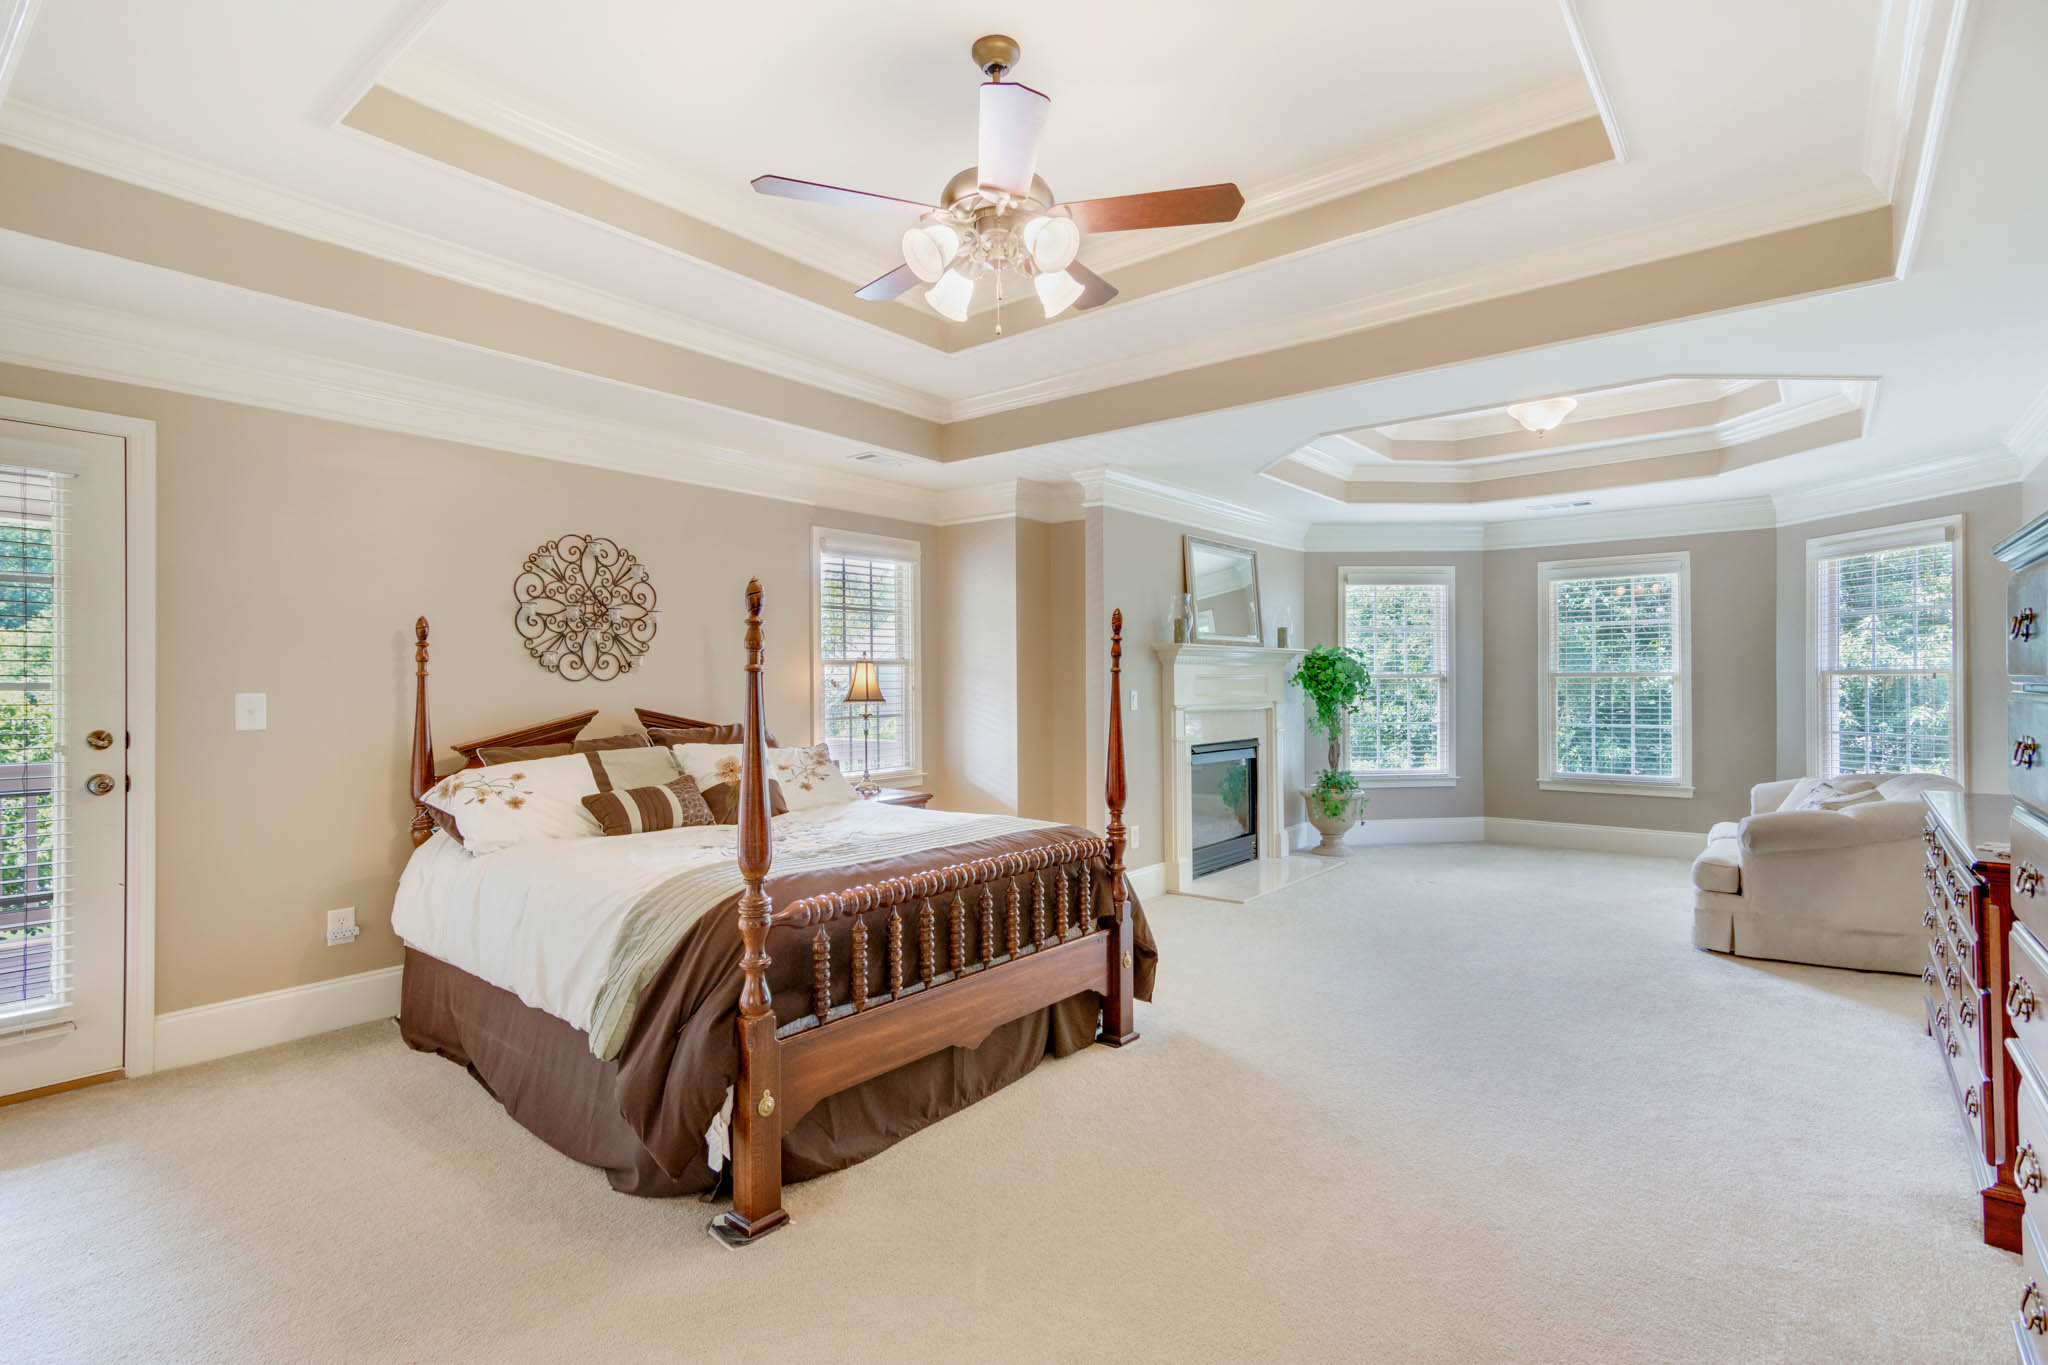 real_estate_photographer_bedroom_photography-5.jpg